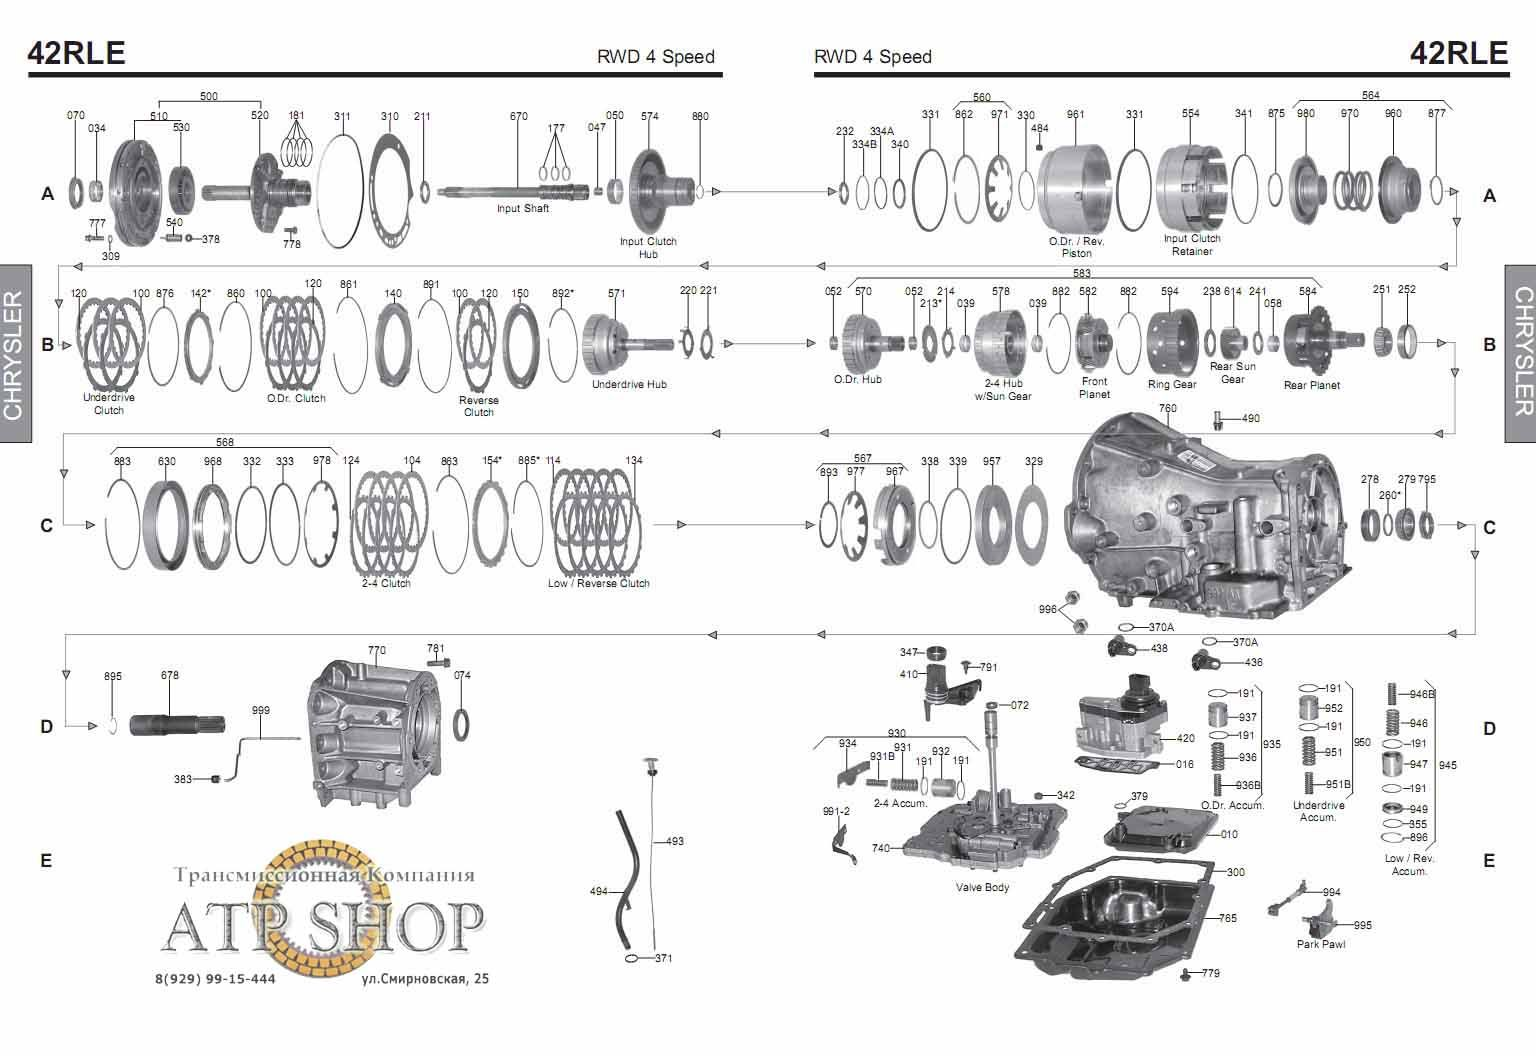 jeep 42rle transmission diagrams wiring diagram expert 42rle transmission wiring diagram 42rle transmission diagram [ 1536 x 1056 Pixel ]